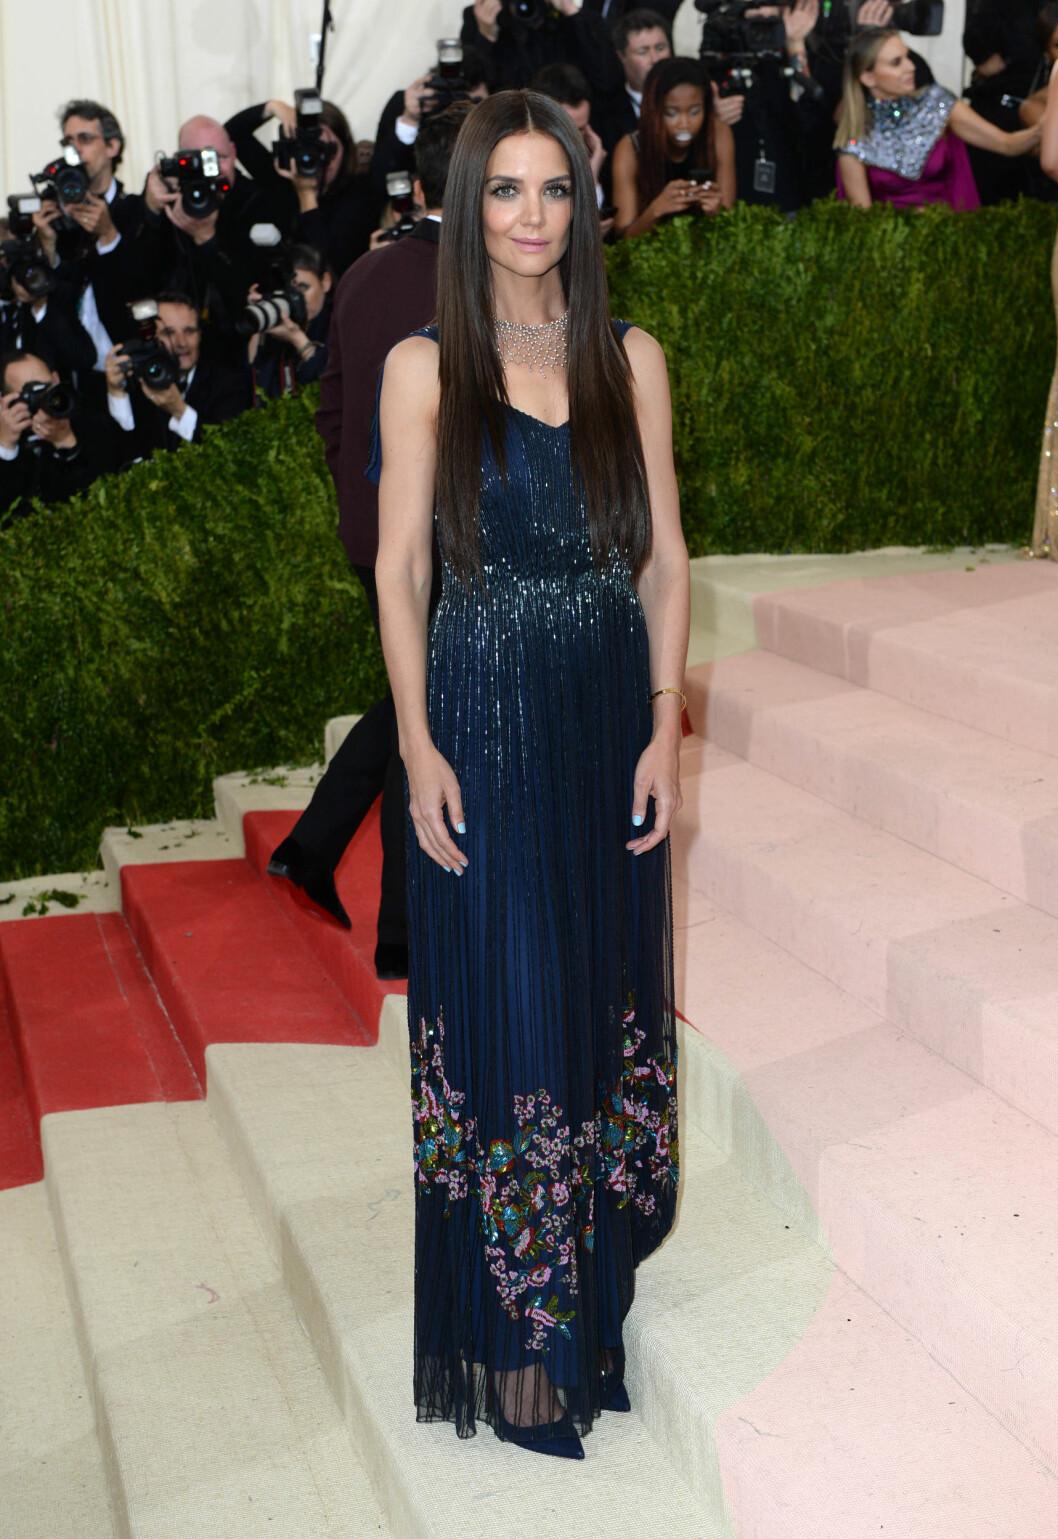 I BLÅTT: Katie Holmes glitret i en kjole fra designervennen Zac Posen. Foto: Pa Photos